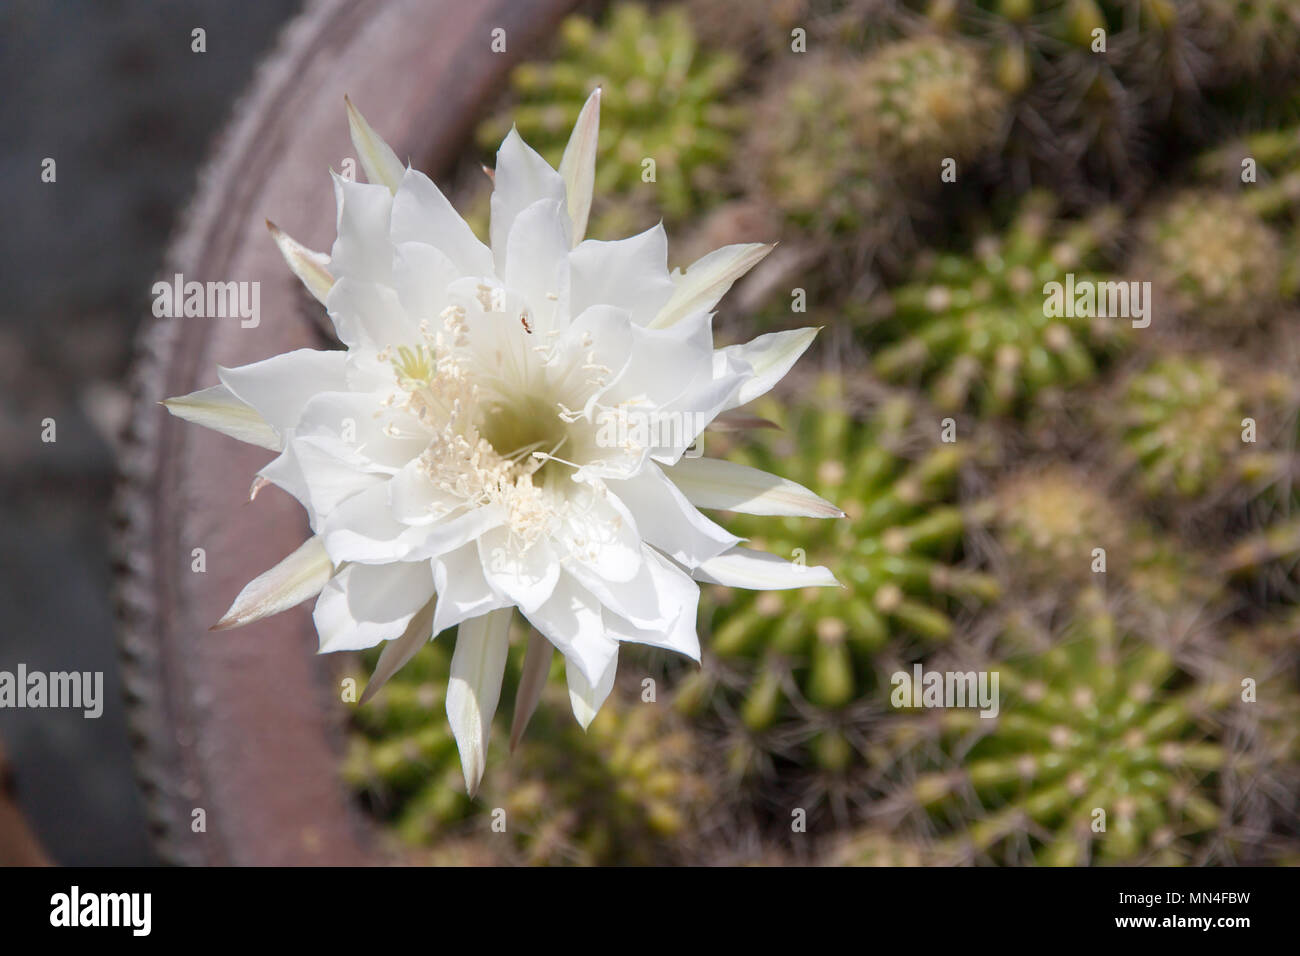 White Cactus Flower Closeup Under Morning Sun Light Nature